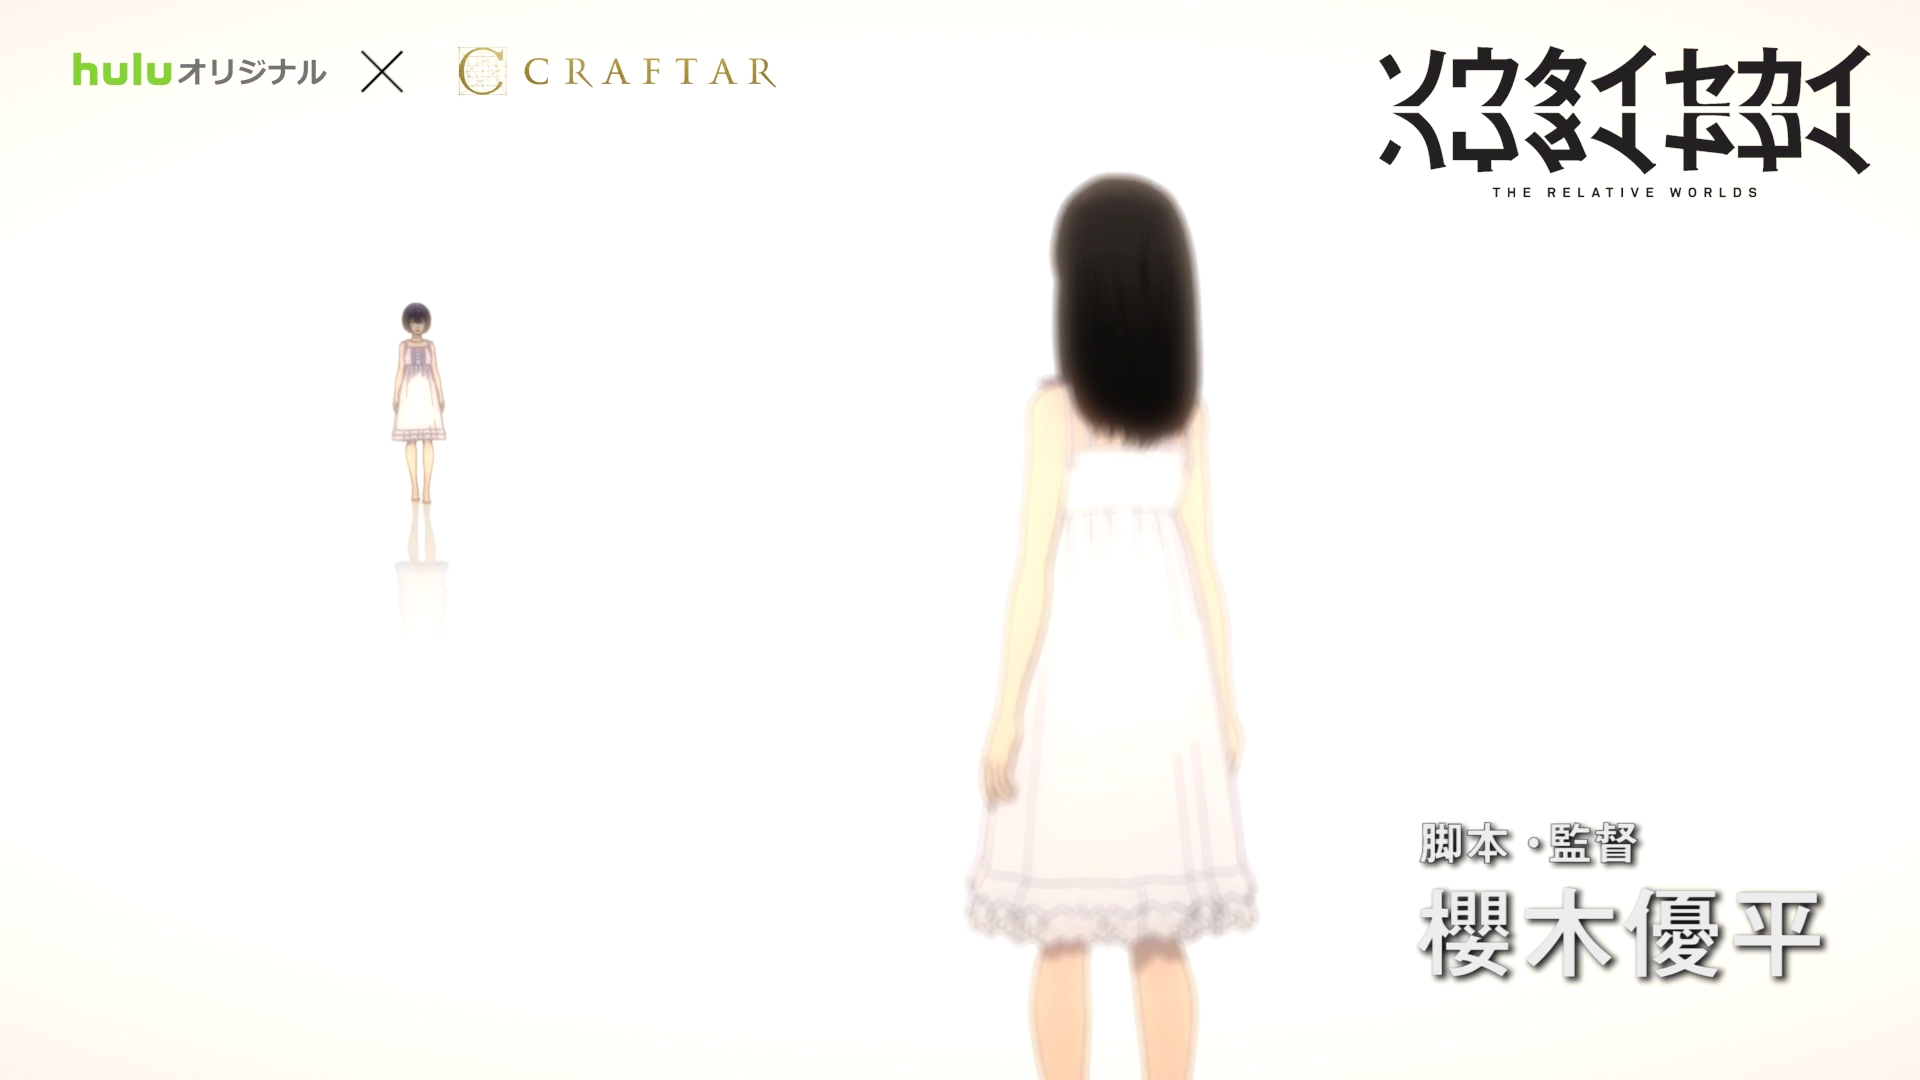 CG动画《ソウタイセカイ(相对世界)》预告片公开-ANICOGA